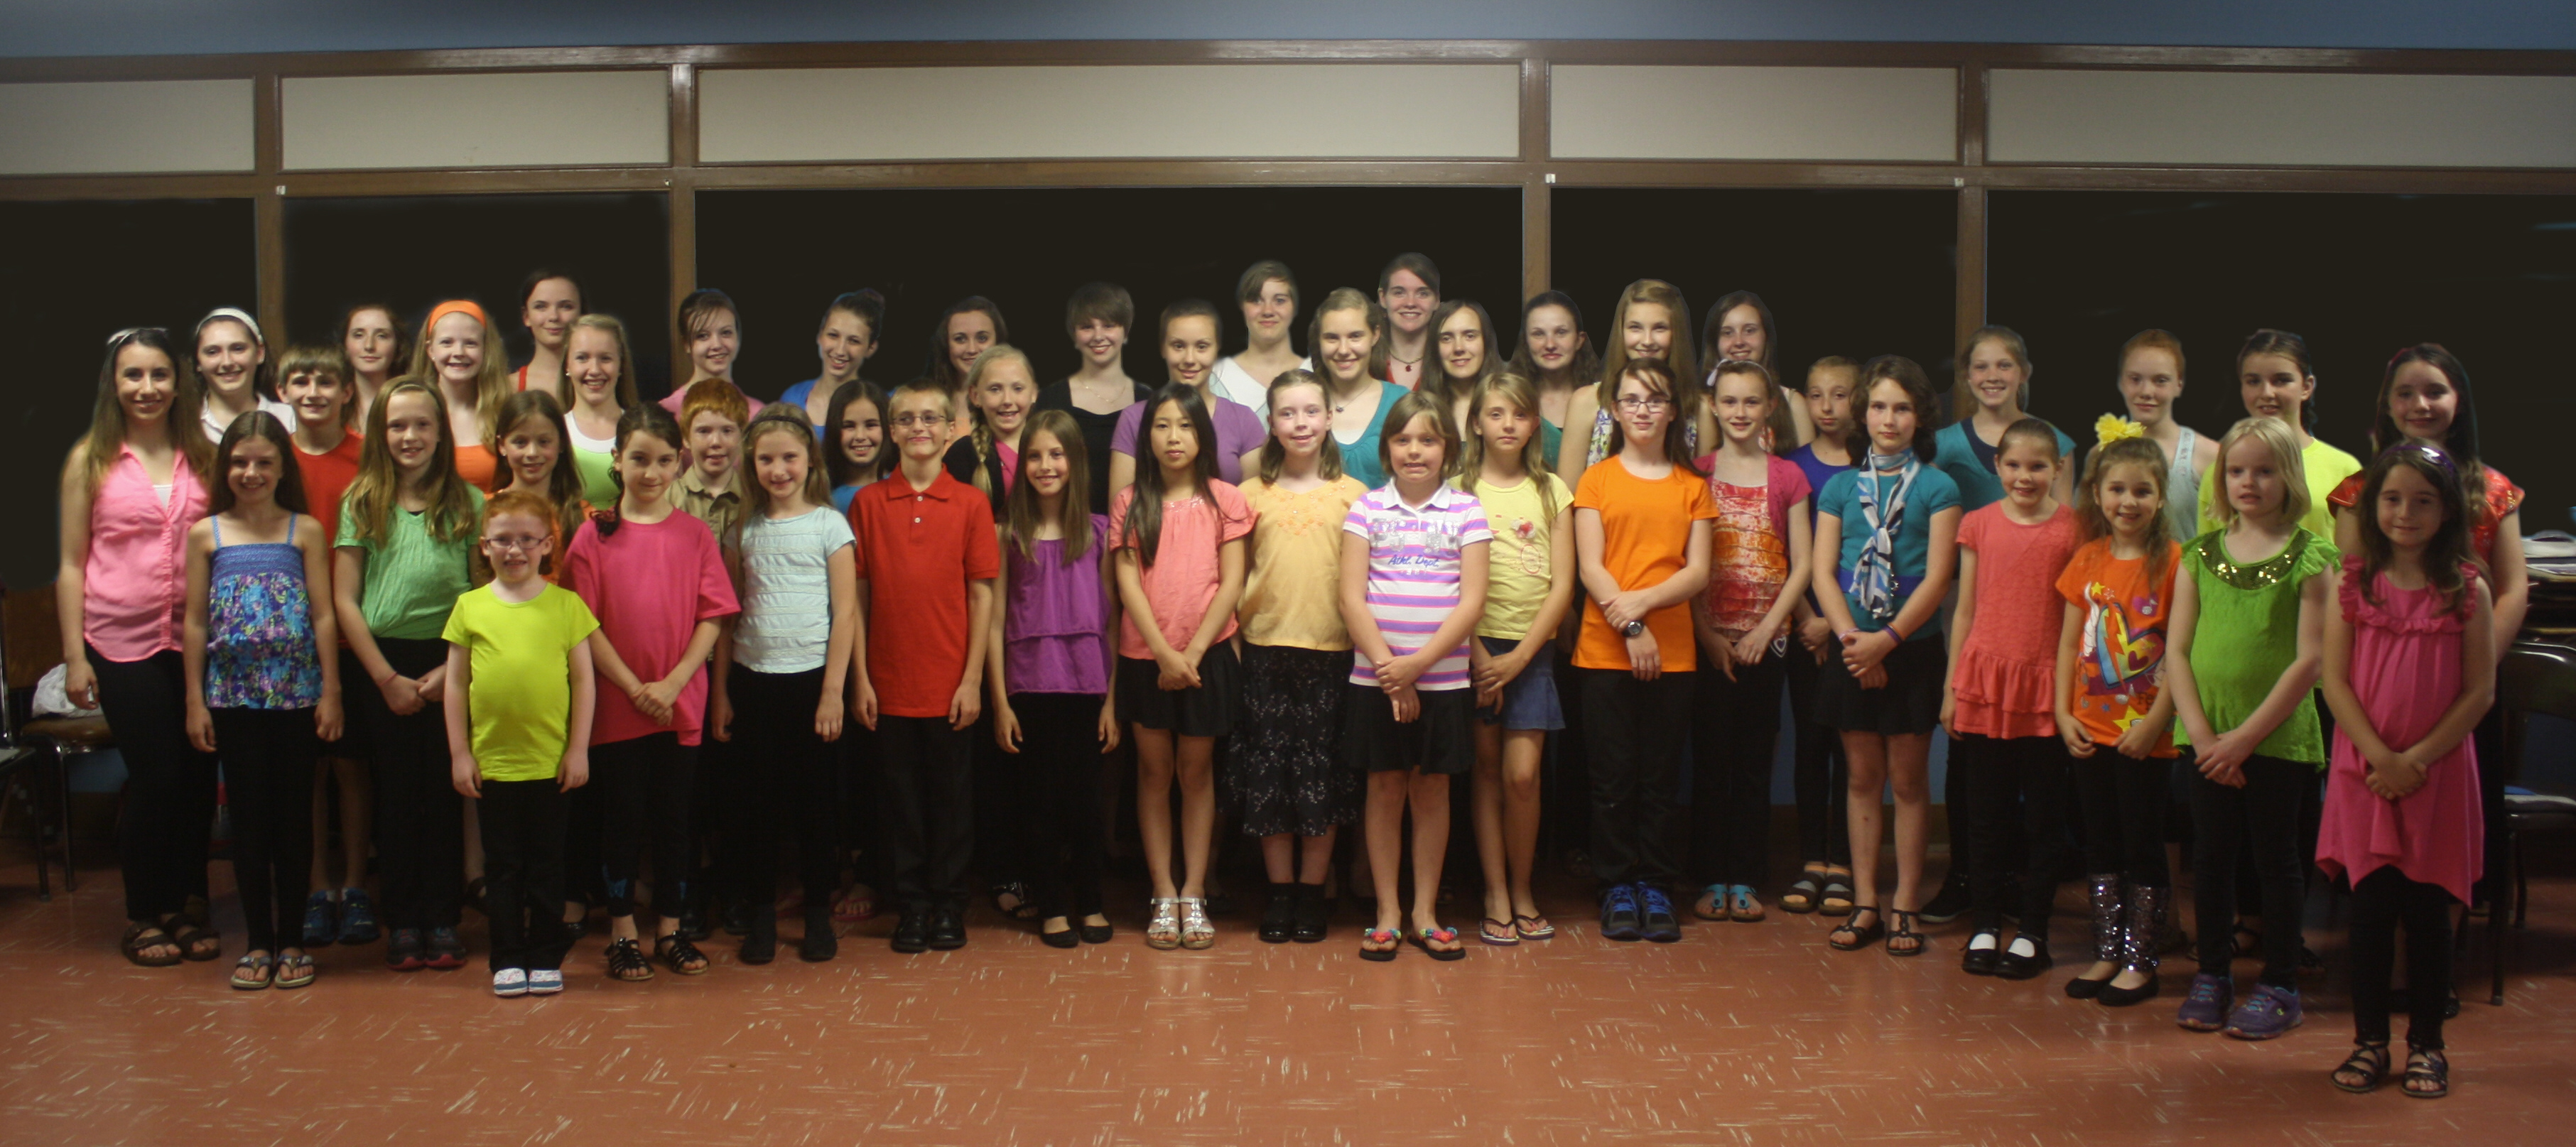 Youth choir2014.EDITED.2